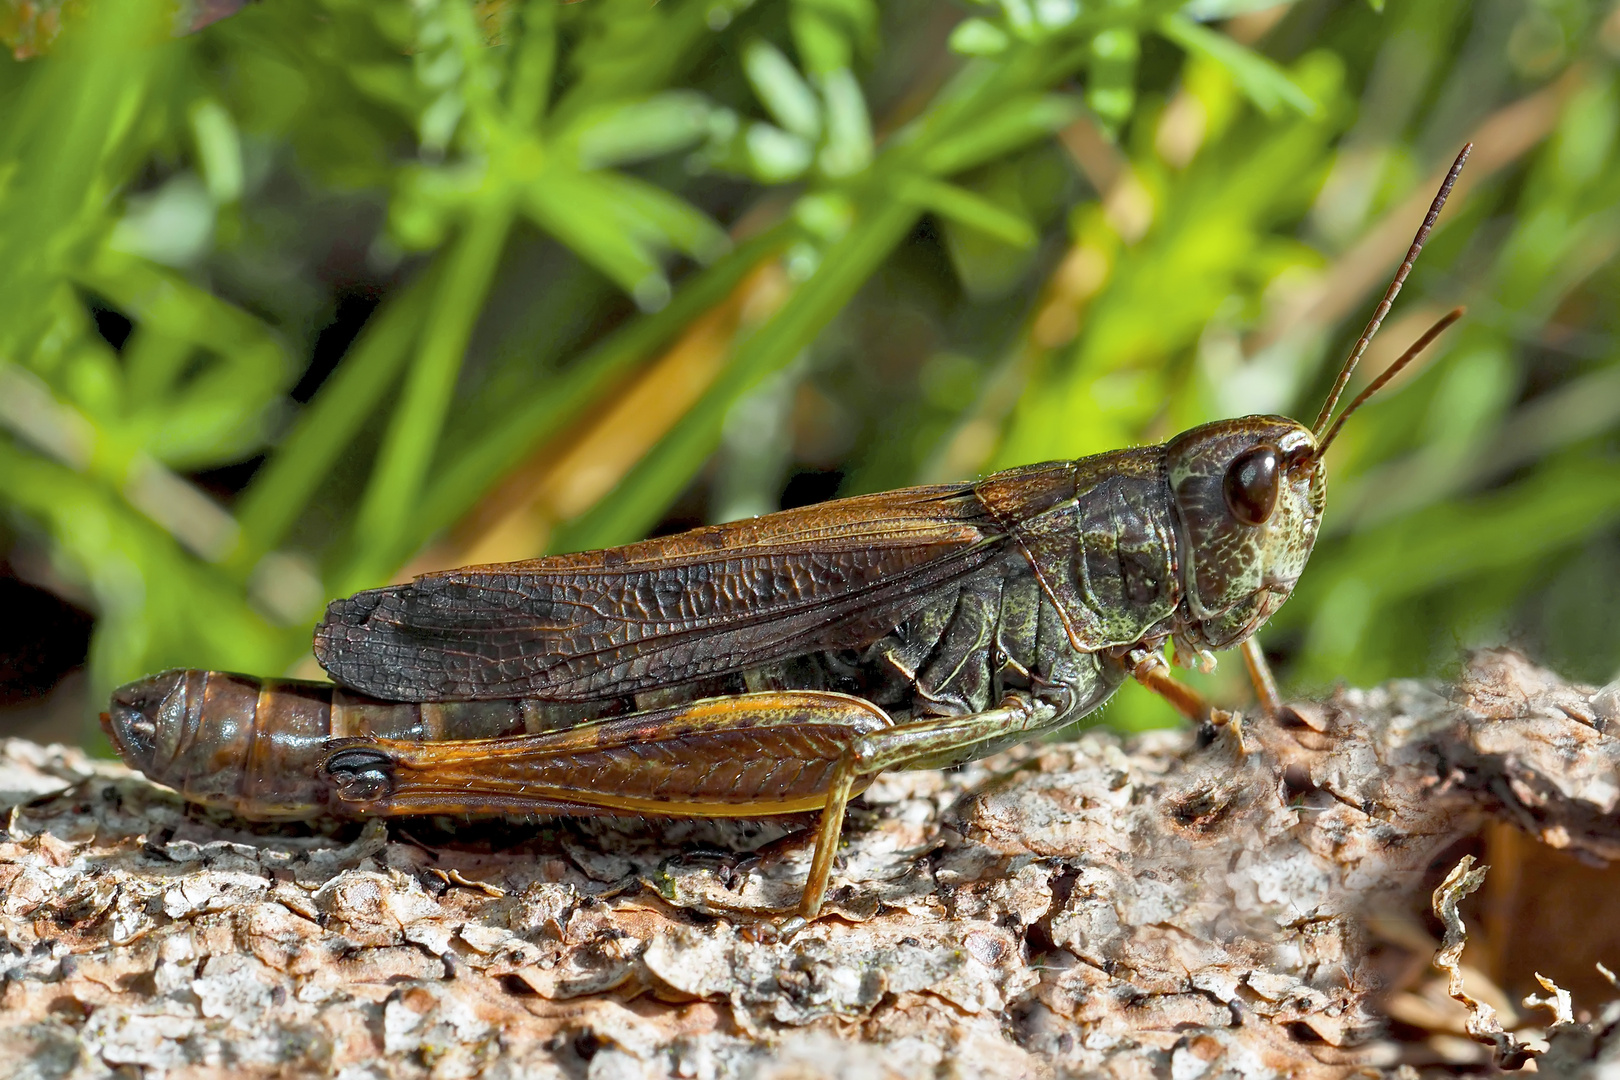 Gebirgsgrashüpfer, Weibchen (Stauroderus scalaris)* - Criquet jacasseur, une femelle.